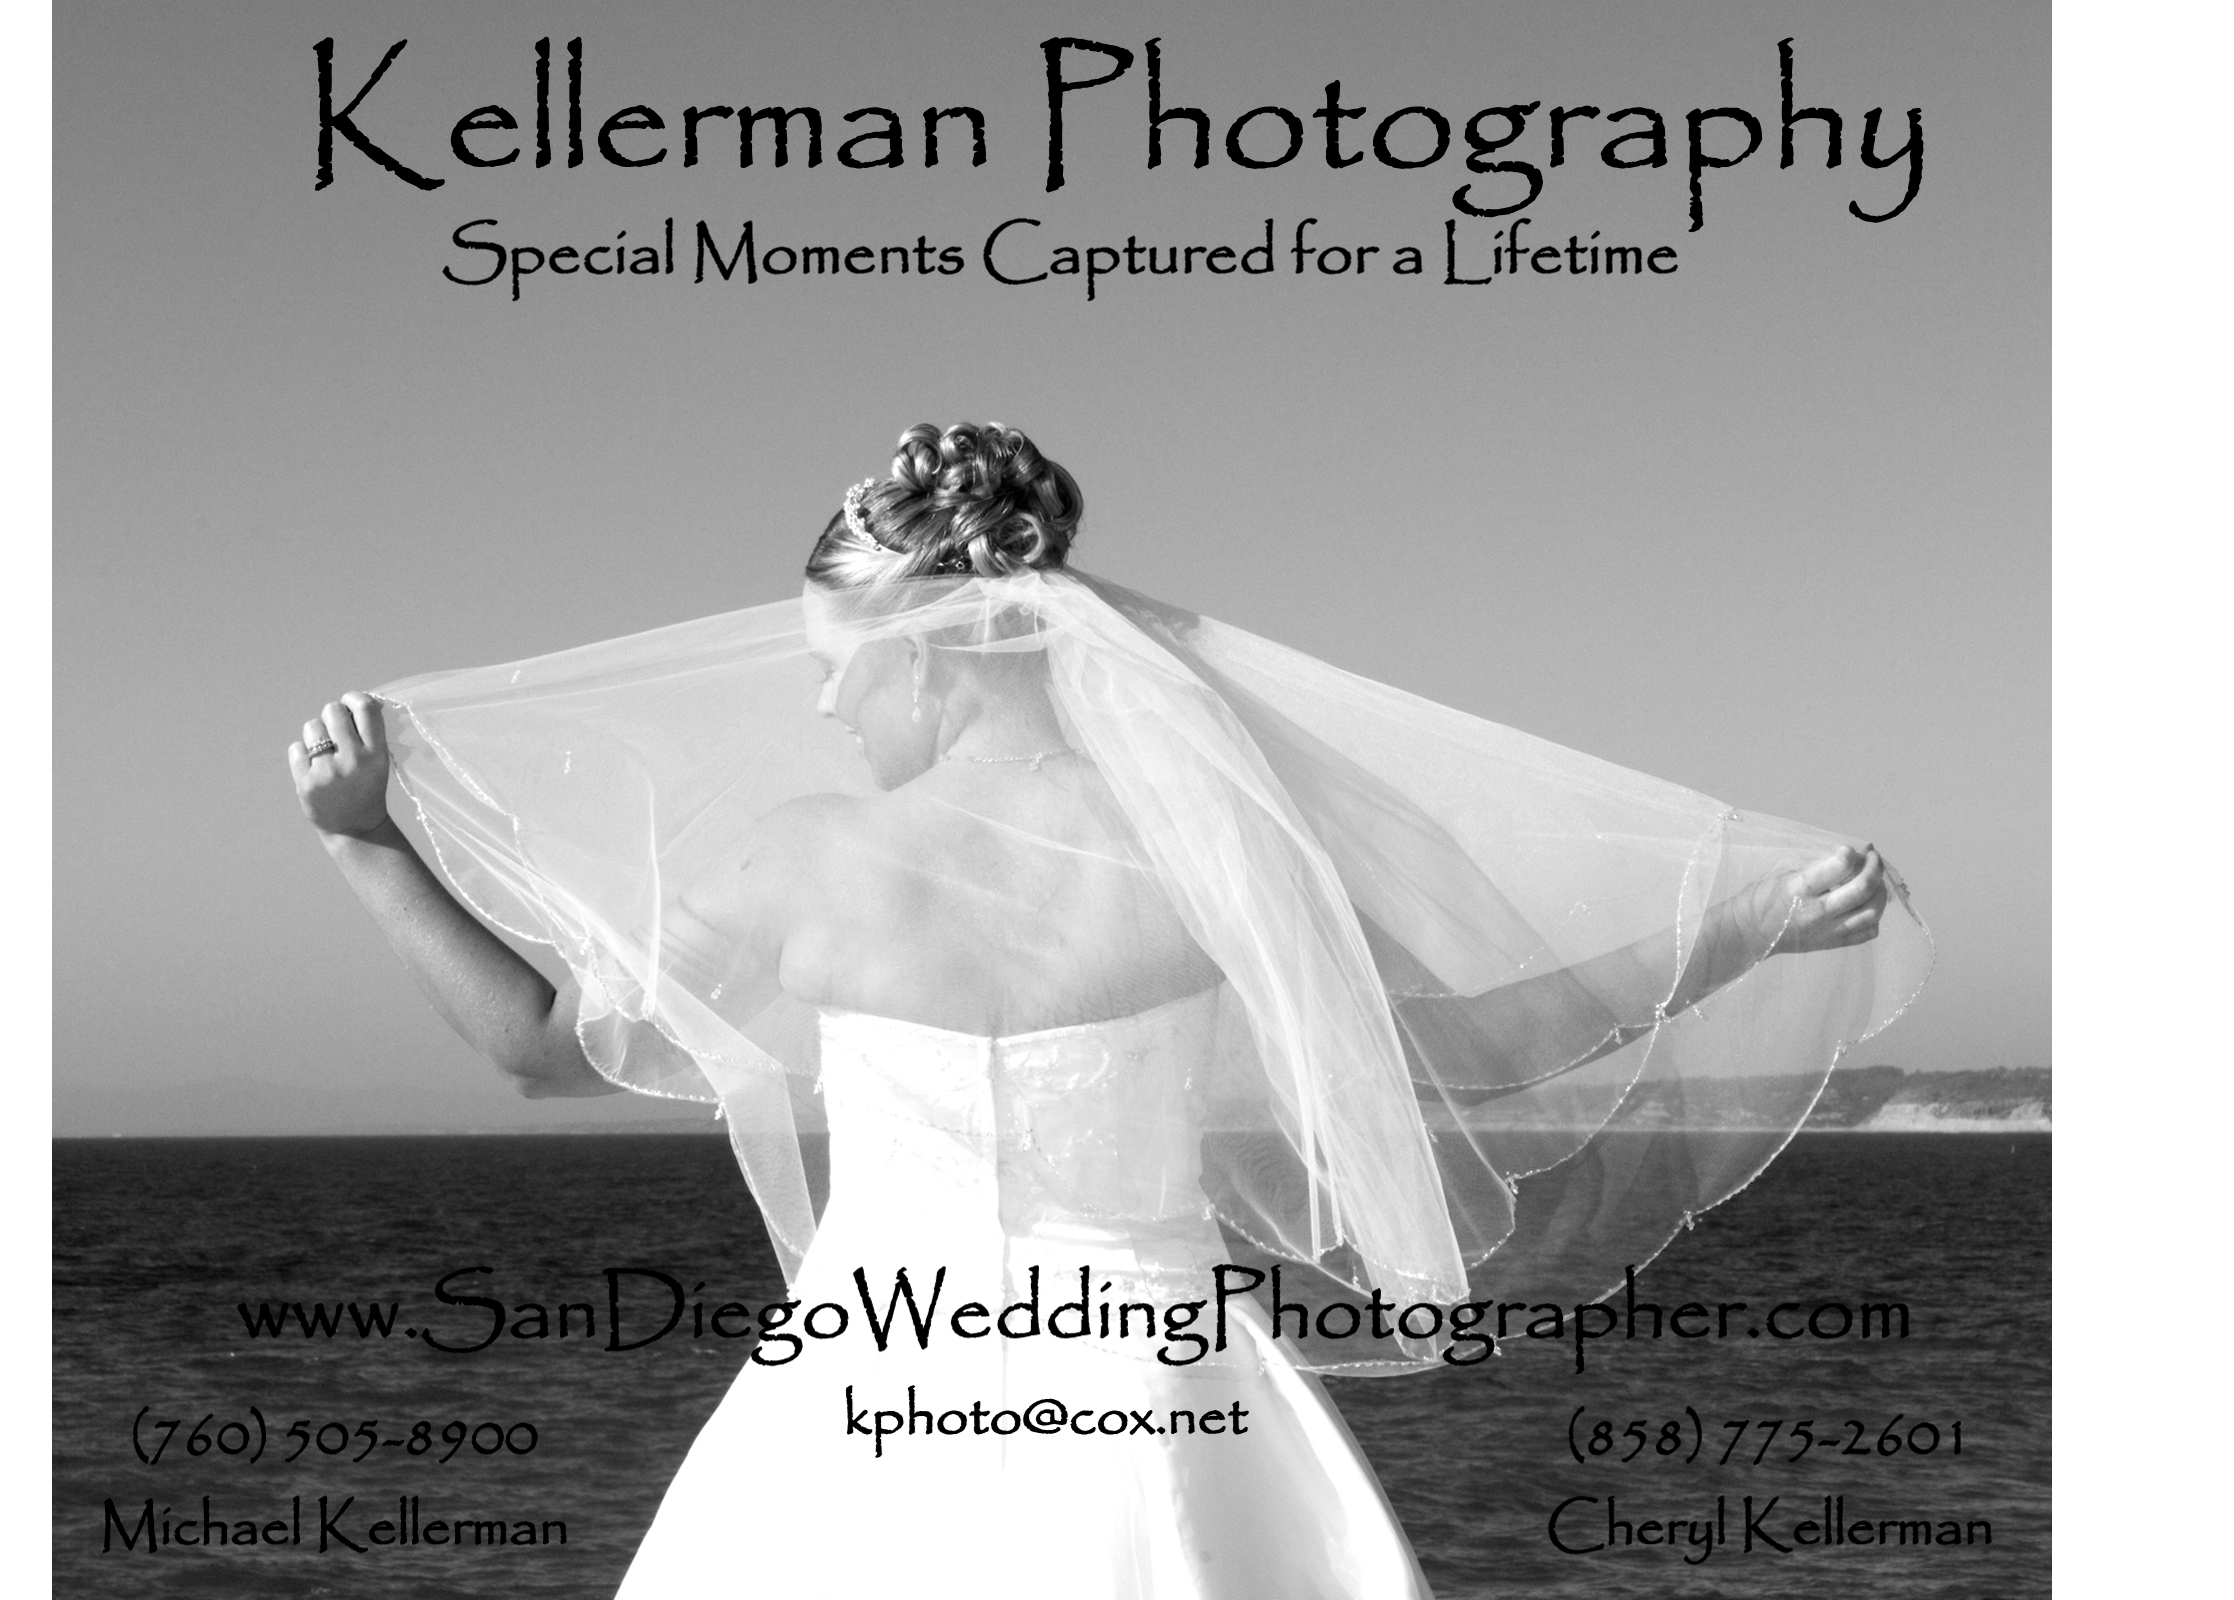 Beauty, Wedding Dresses, Veils, Beach Wedding Dresses, Fashion, dress, Makeup, Beach, Bride, Portraits, Veil, Gown, Ring, Hair, Ocean, Jewlery, Love, Kellerman photography, Excitement, Tierra